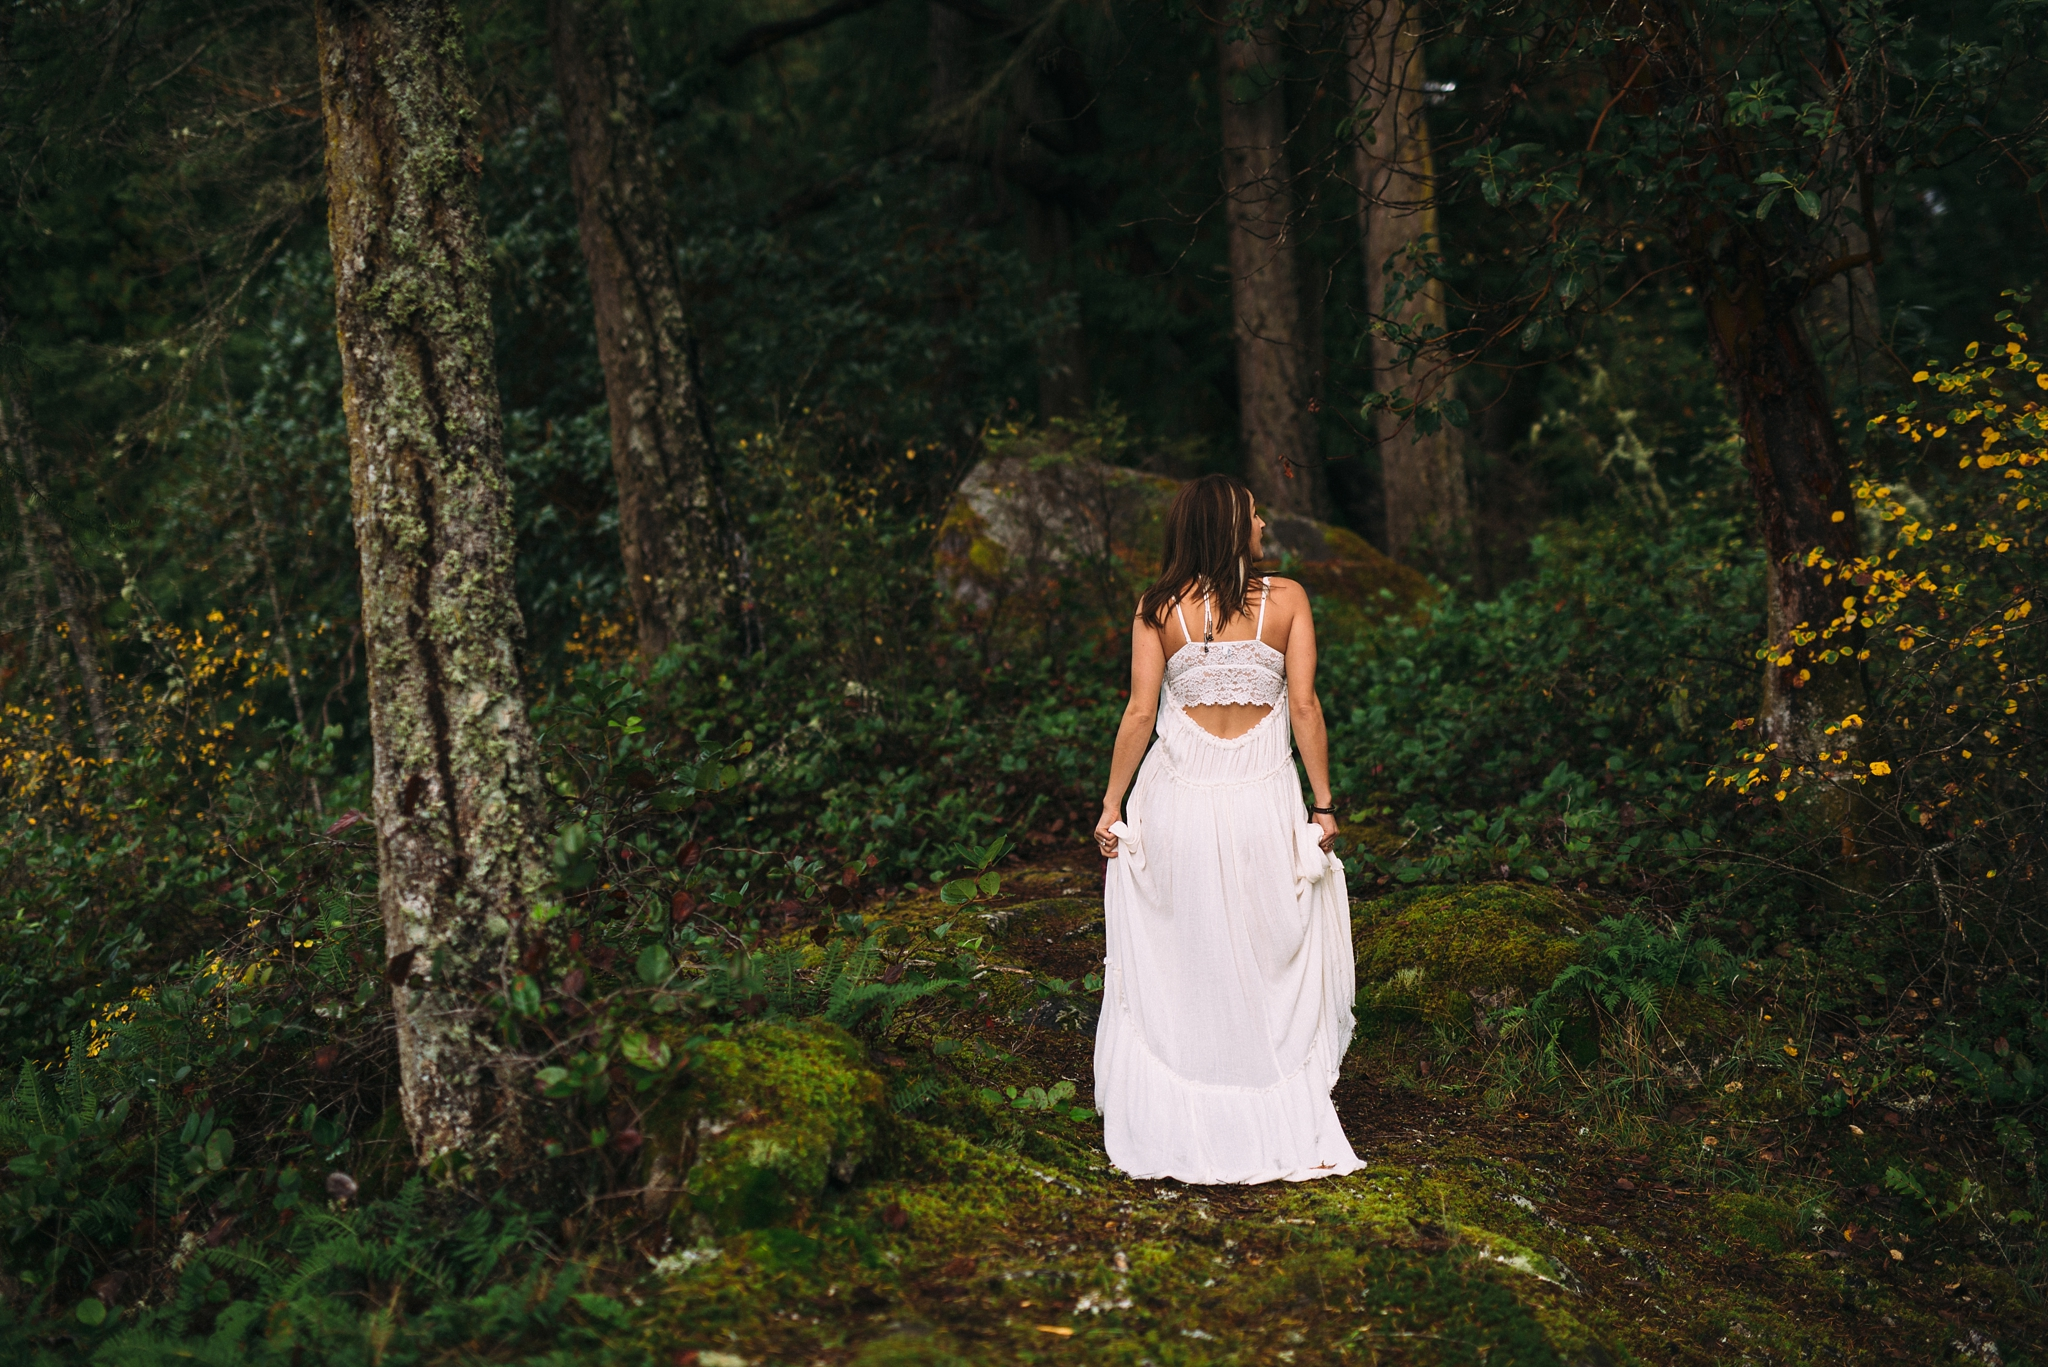 kaihla_tonai_intimate_wedding_elopement_photographer_3388